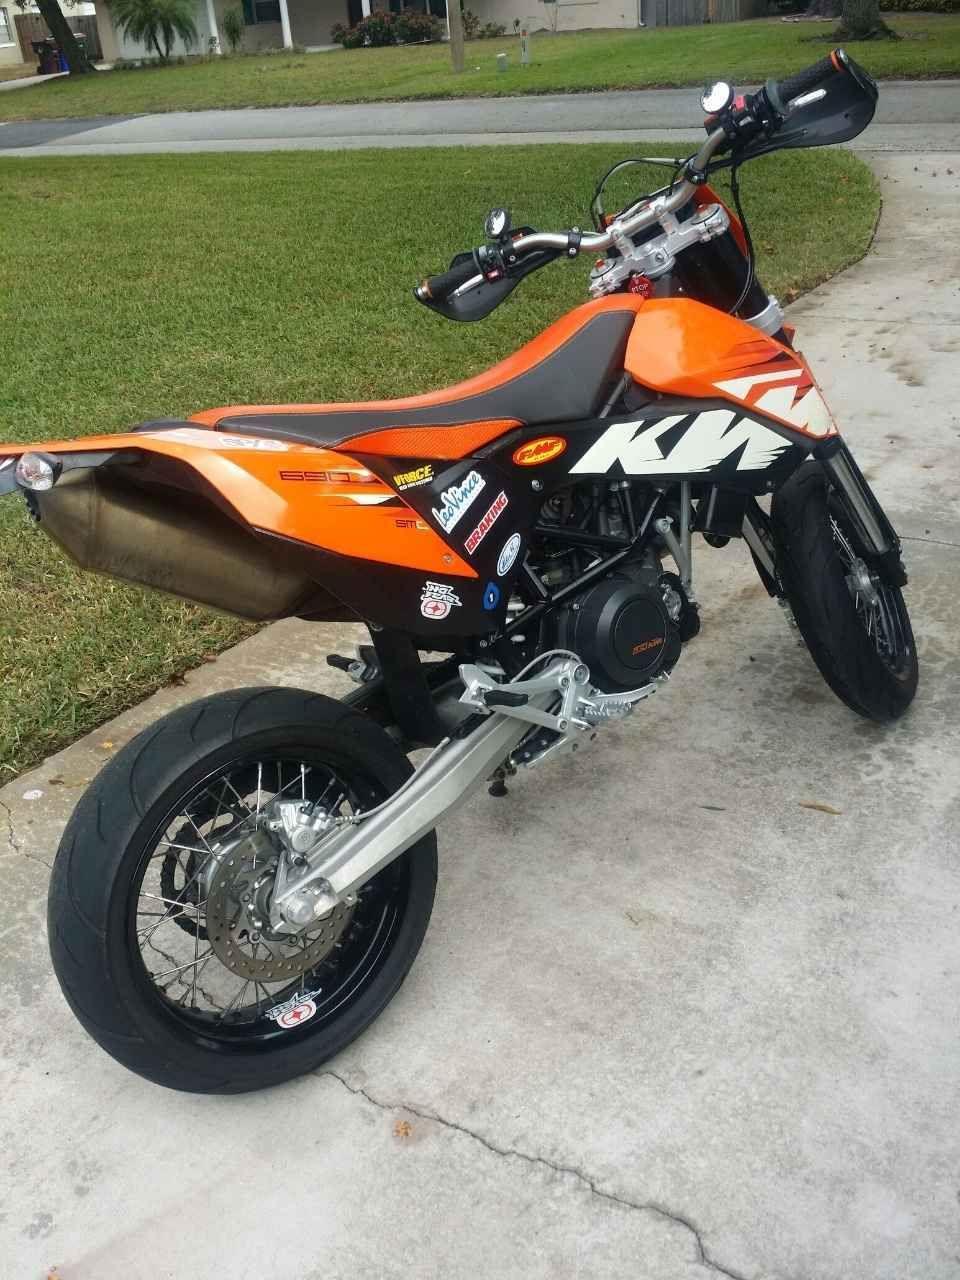 2009 KTM SMC 690 Ktm, Motorcycles for sale, Motorcycle